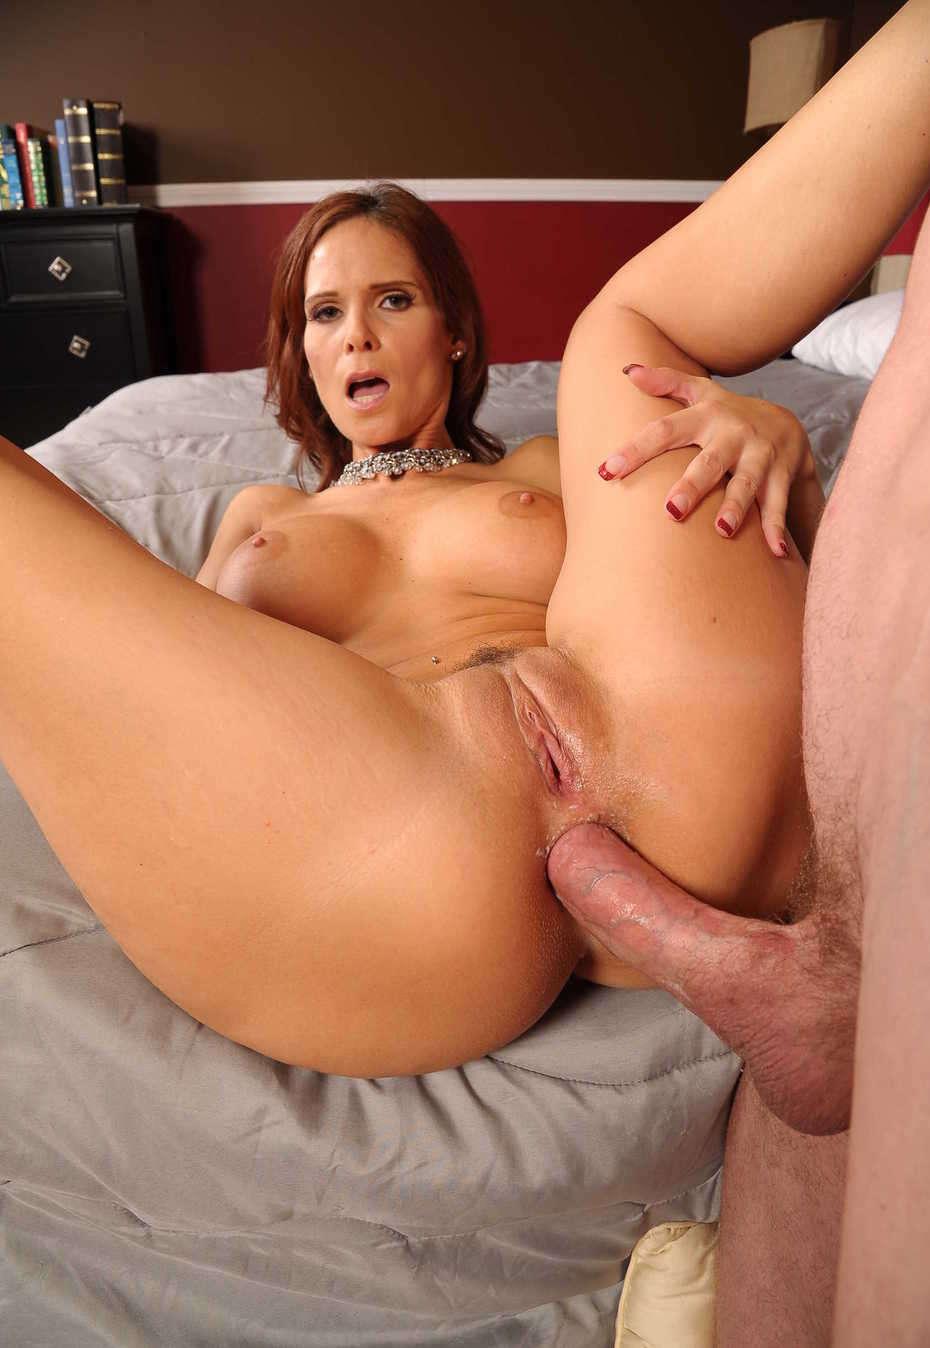 Naked mature women having sex